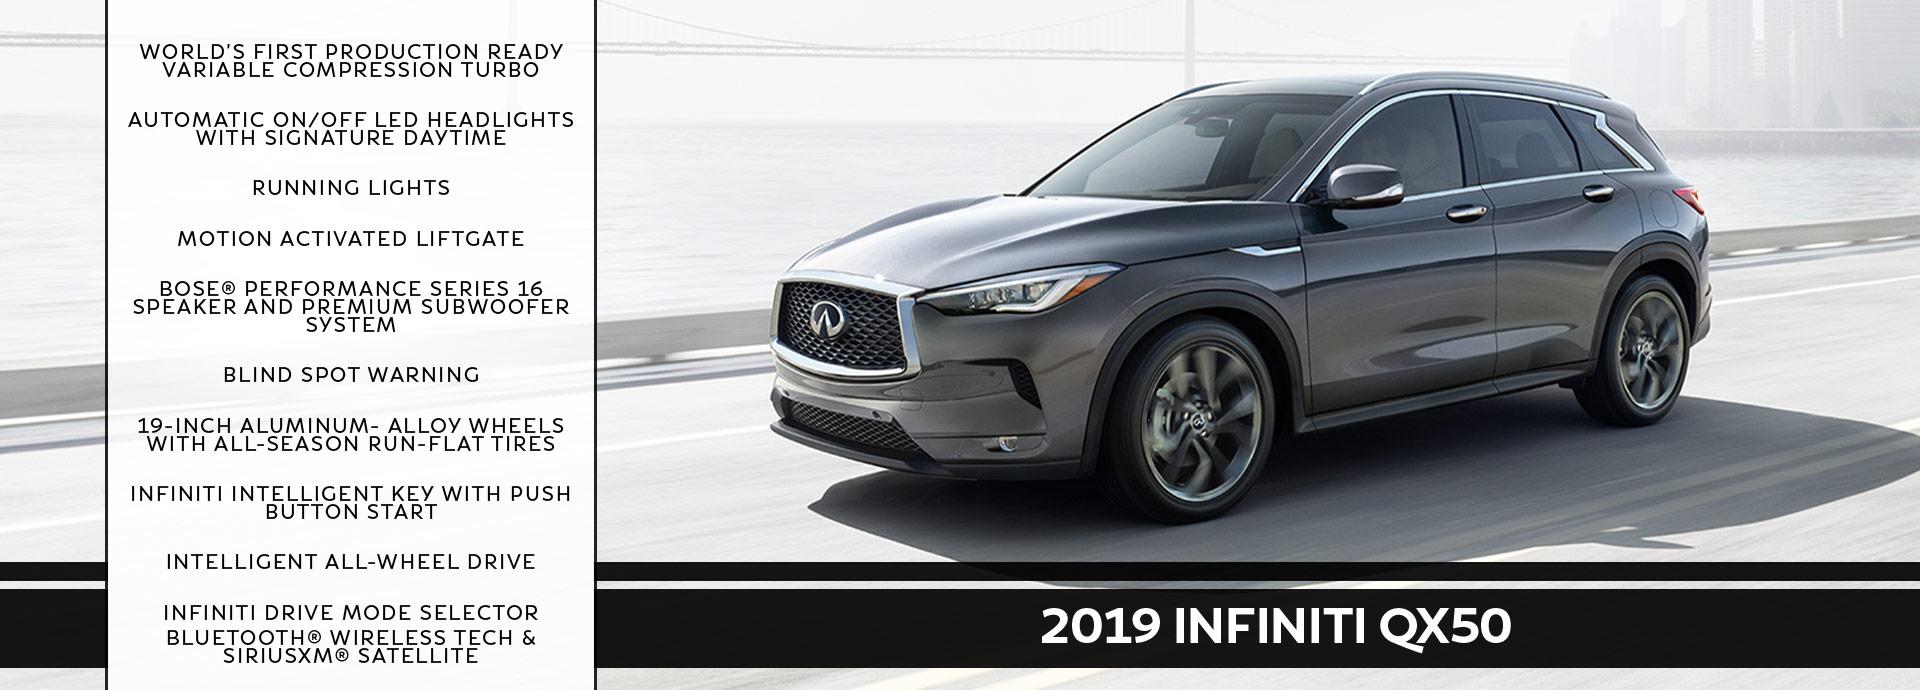 New 2019 INFINITI QX50 Offer